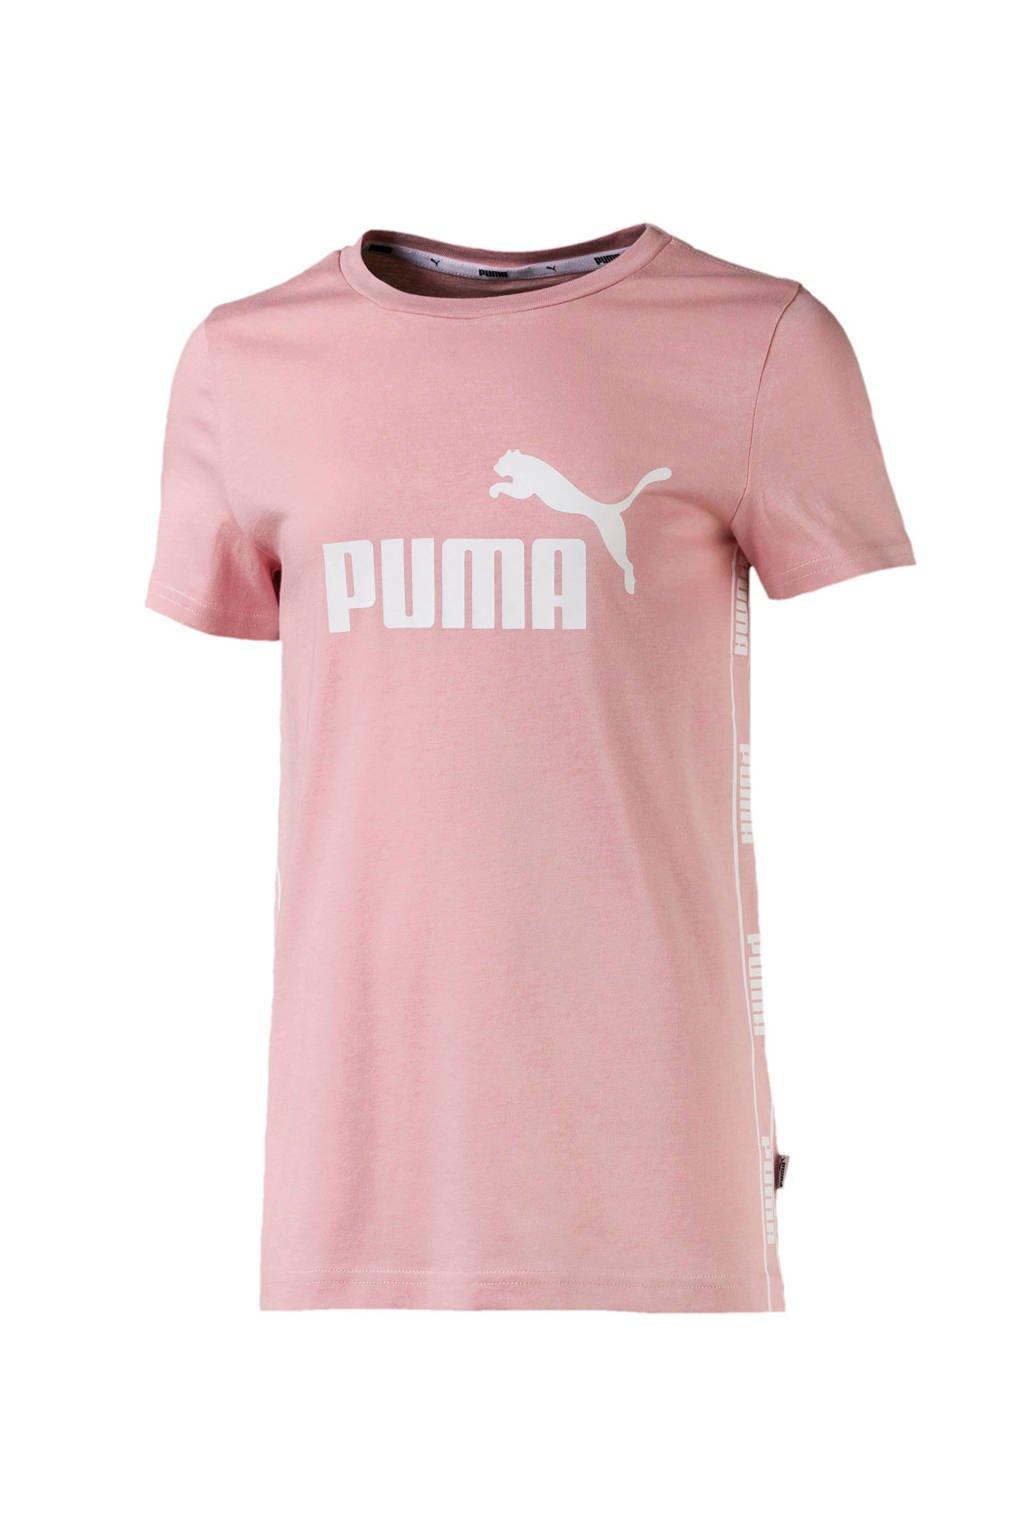 Puma T-shirt roze, Roze